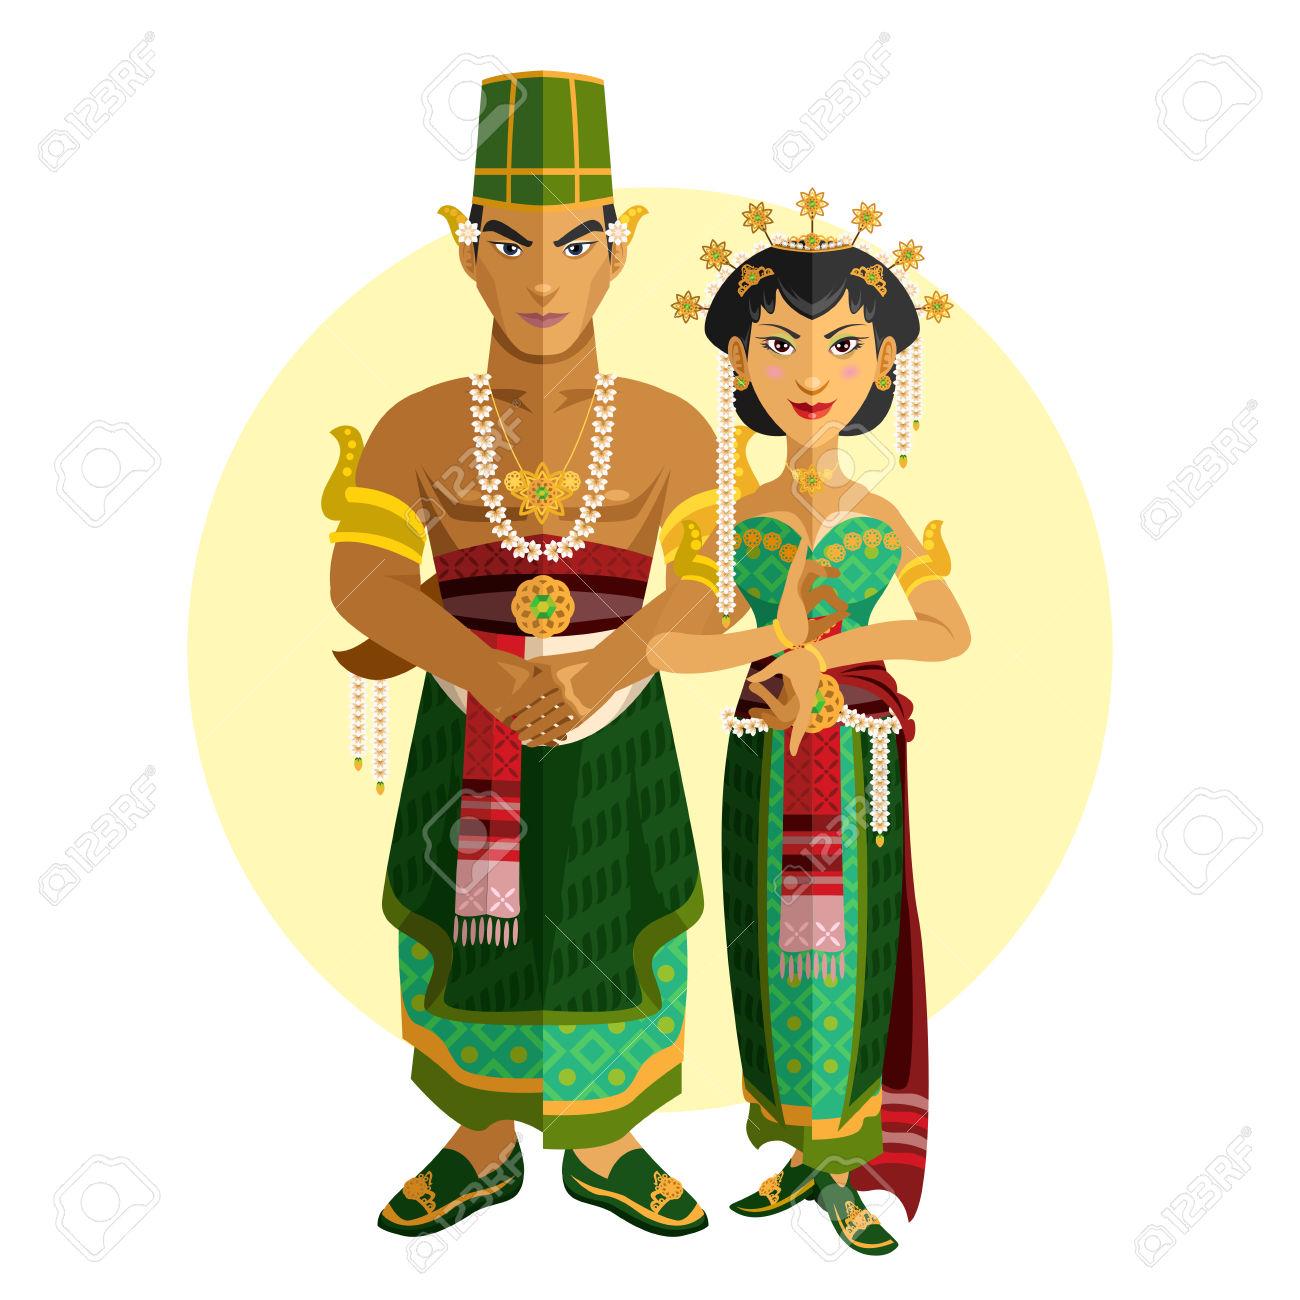 Indonesian Central Java Wedding Ceremony Illustration Of.